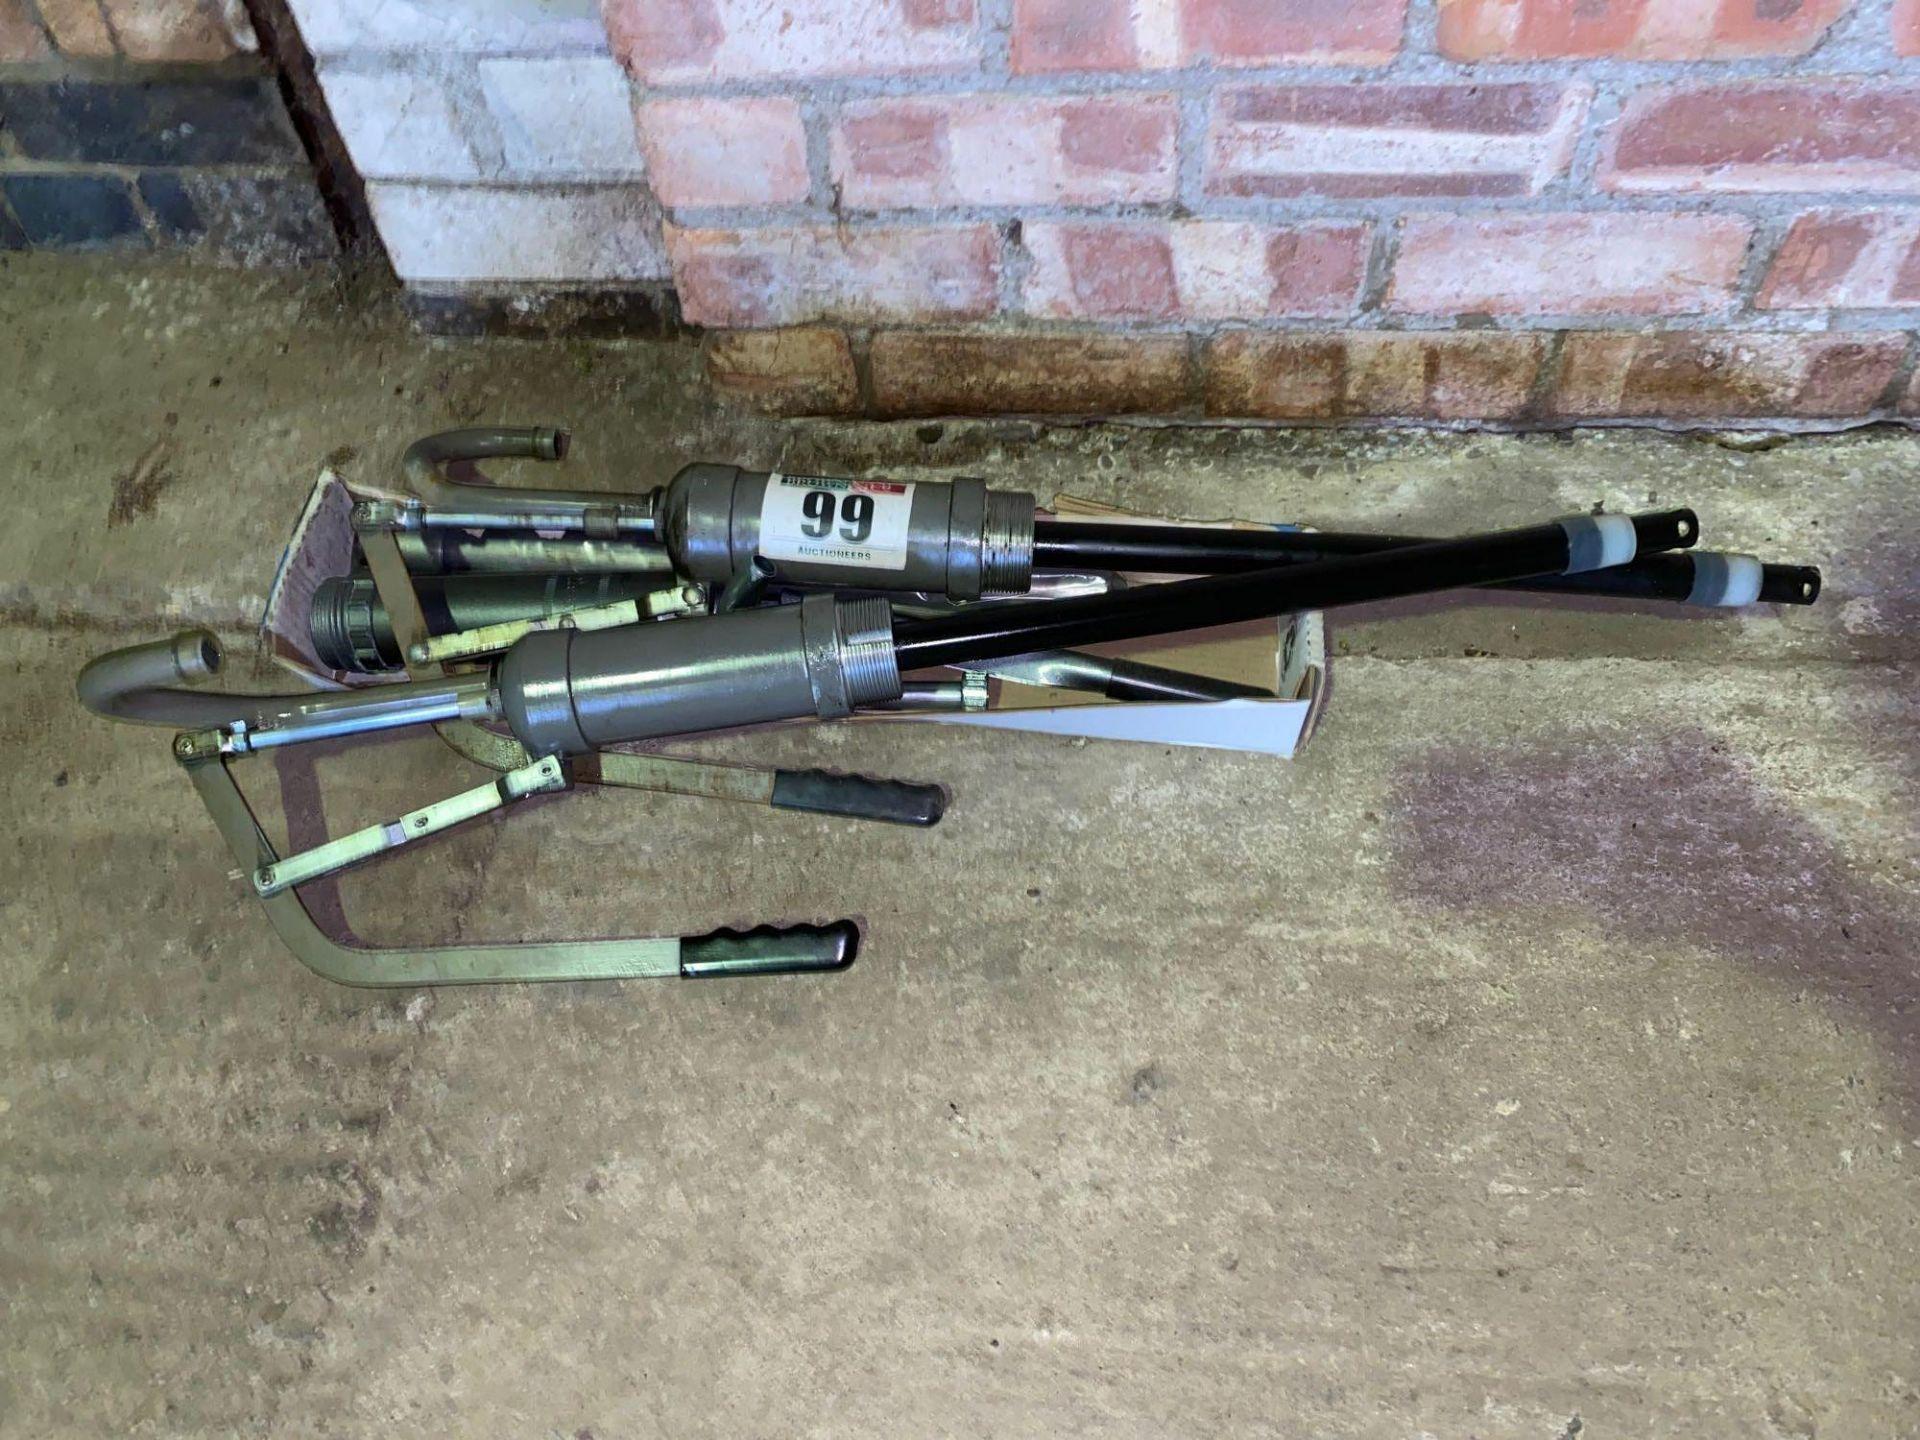 3 x Oil drum pumps - Image 2 of 2